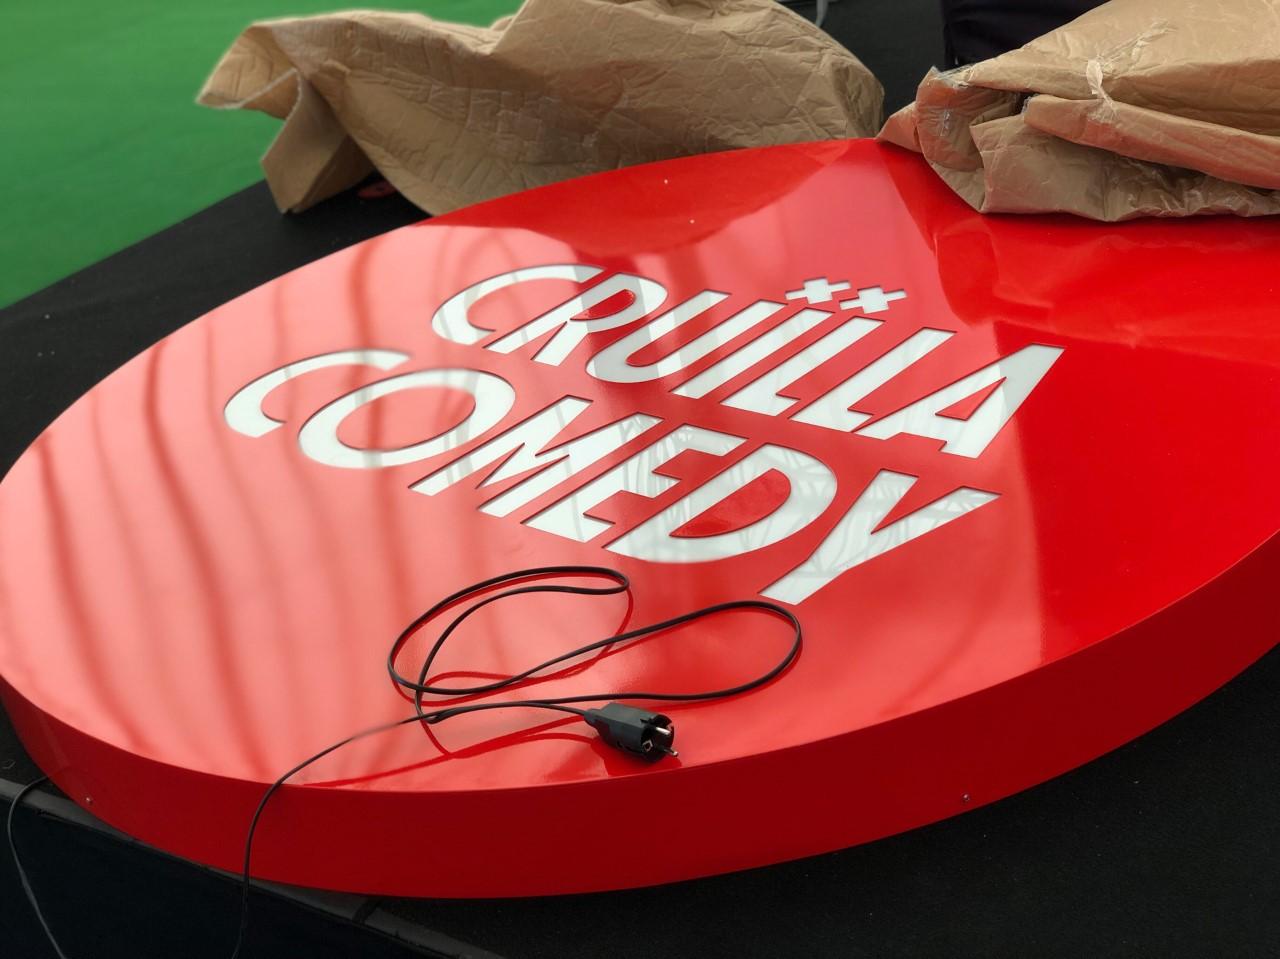 cruilla-comedy-festivales-27lletres-03.jpg